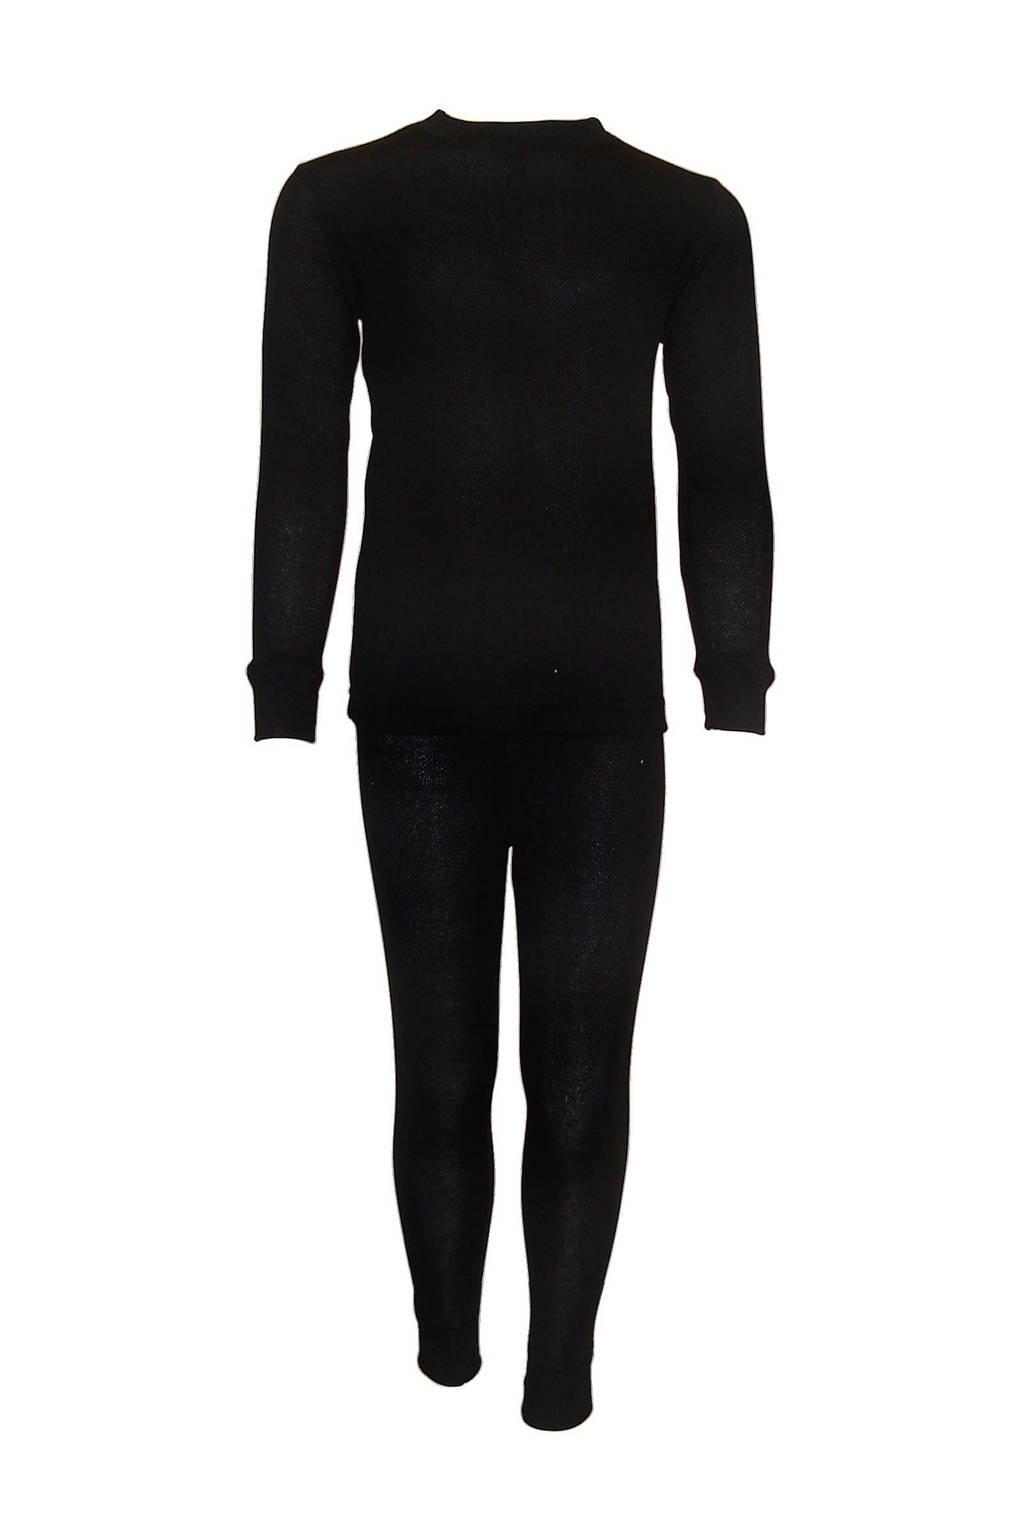 Campri thermo shirt + thermo broek, Zwart